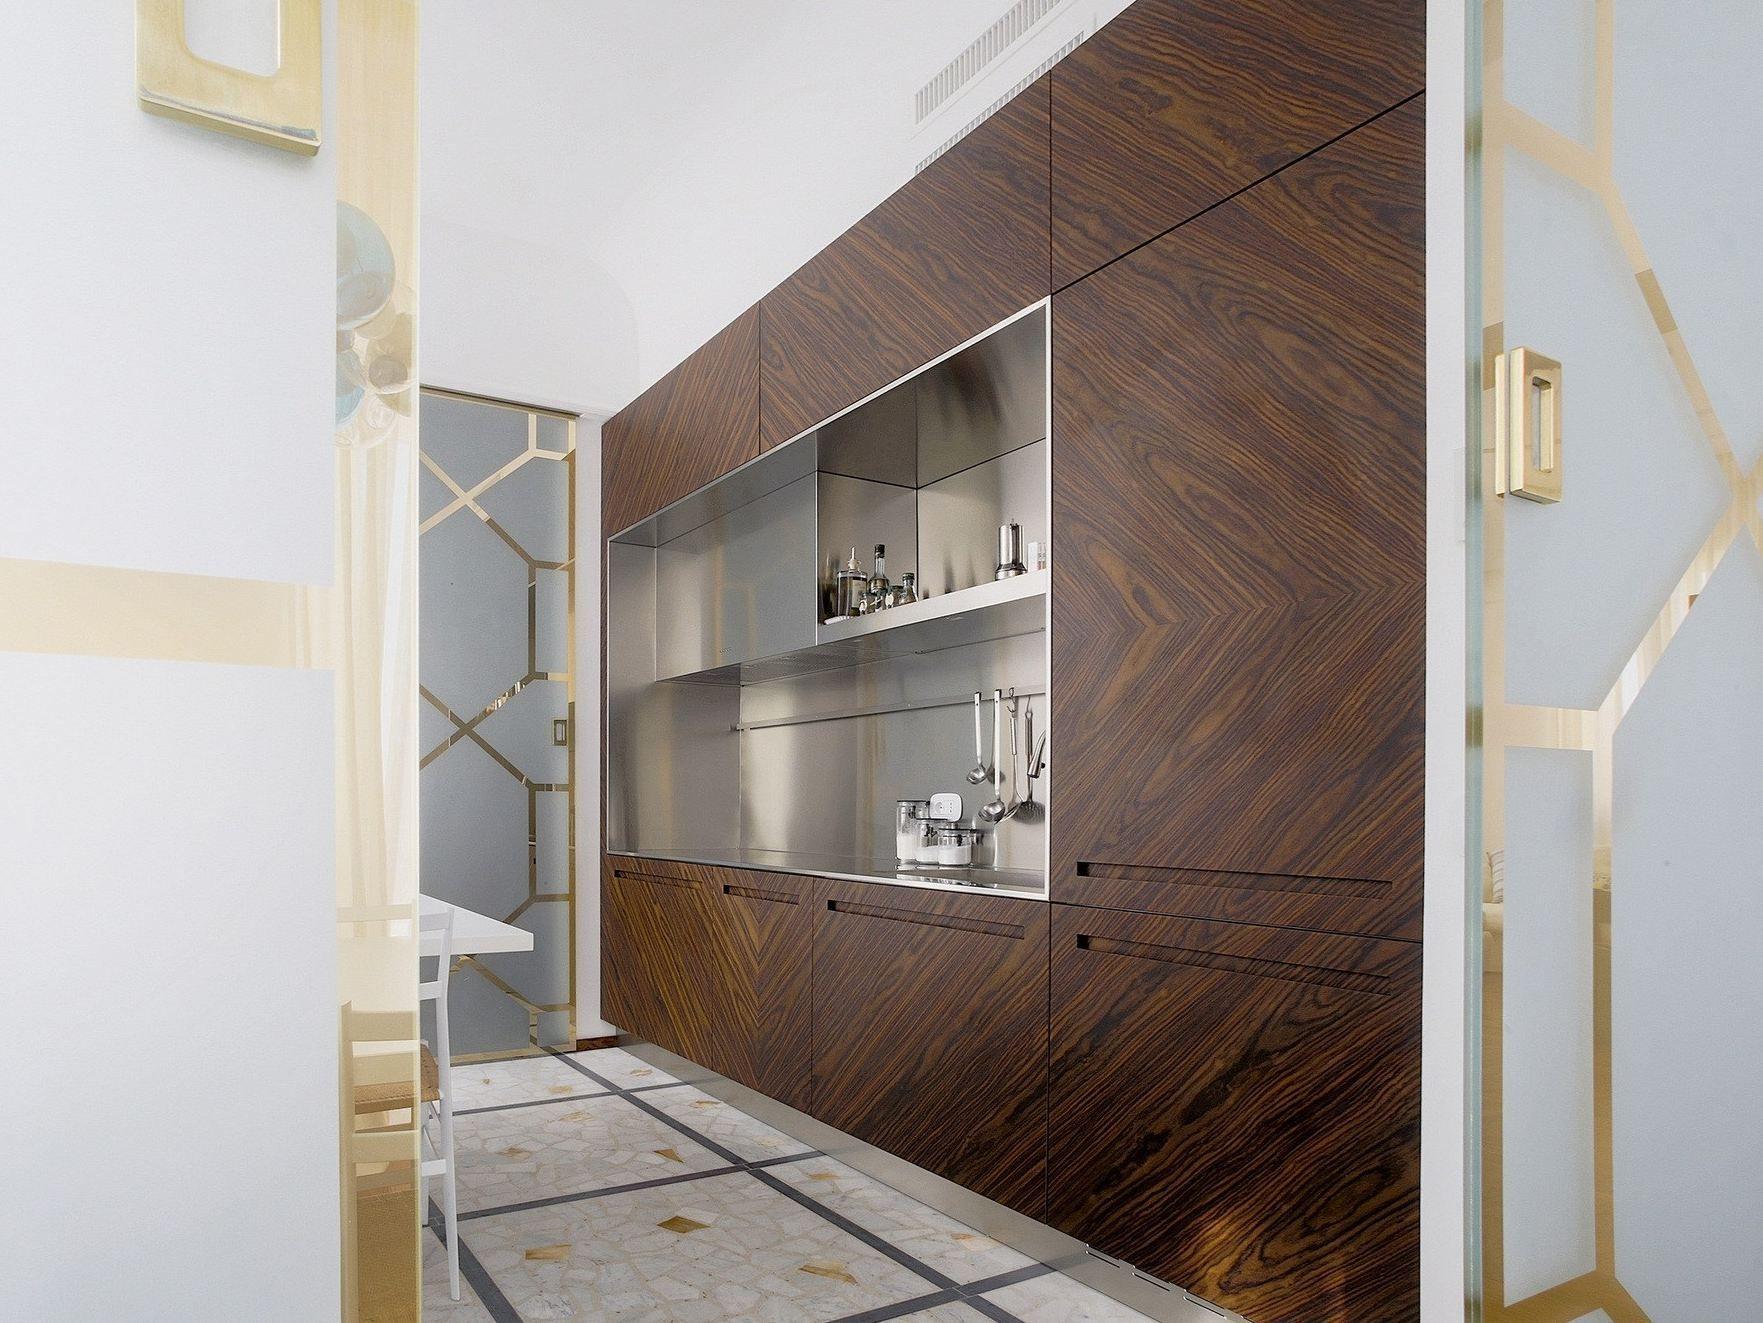 D90 cucina in palissandro by tm italia cucine - Cucine legno e acciaio ...